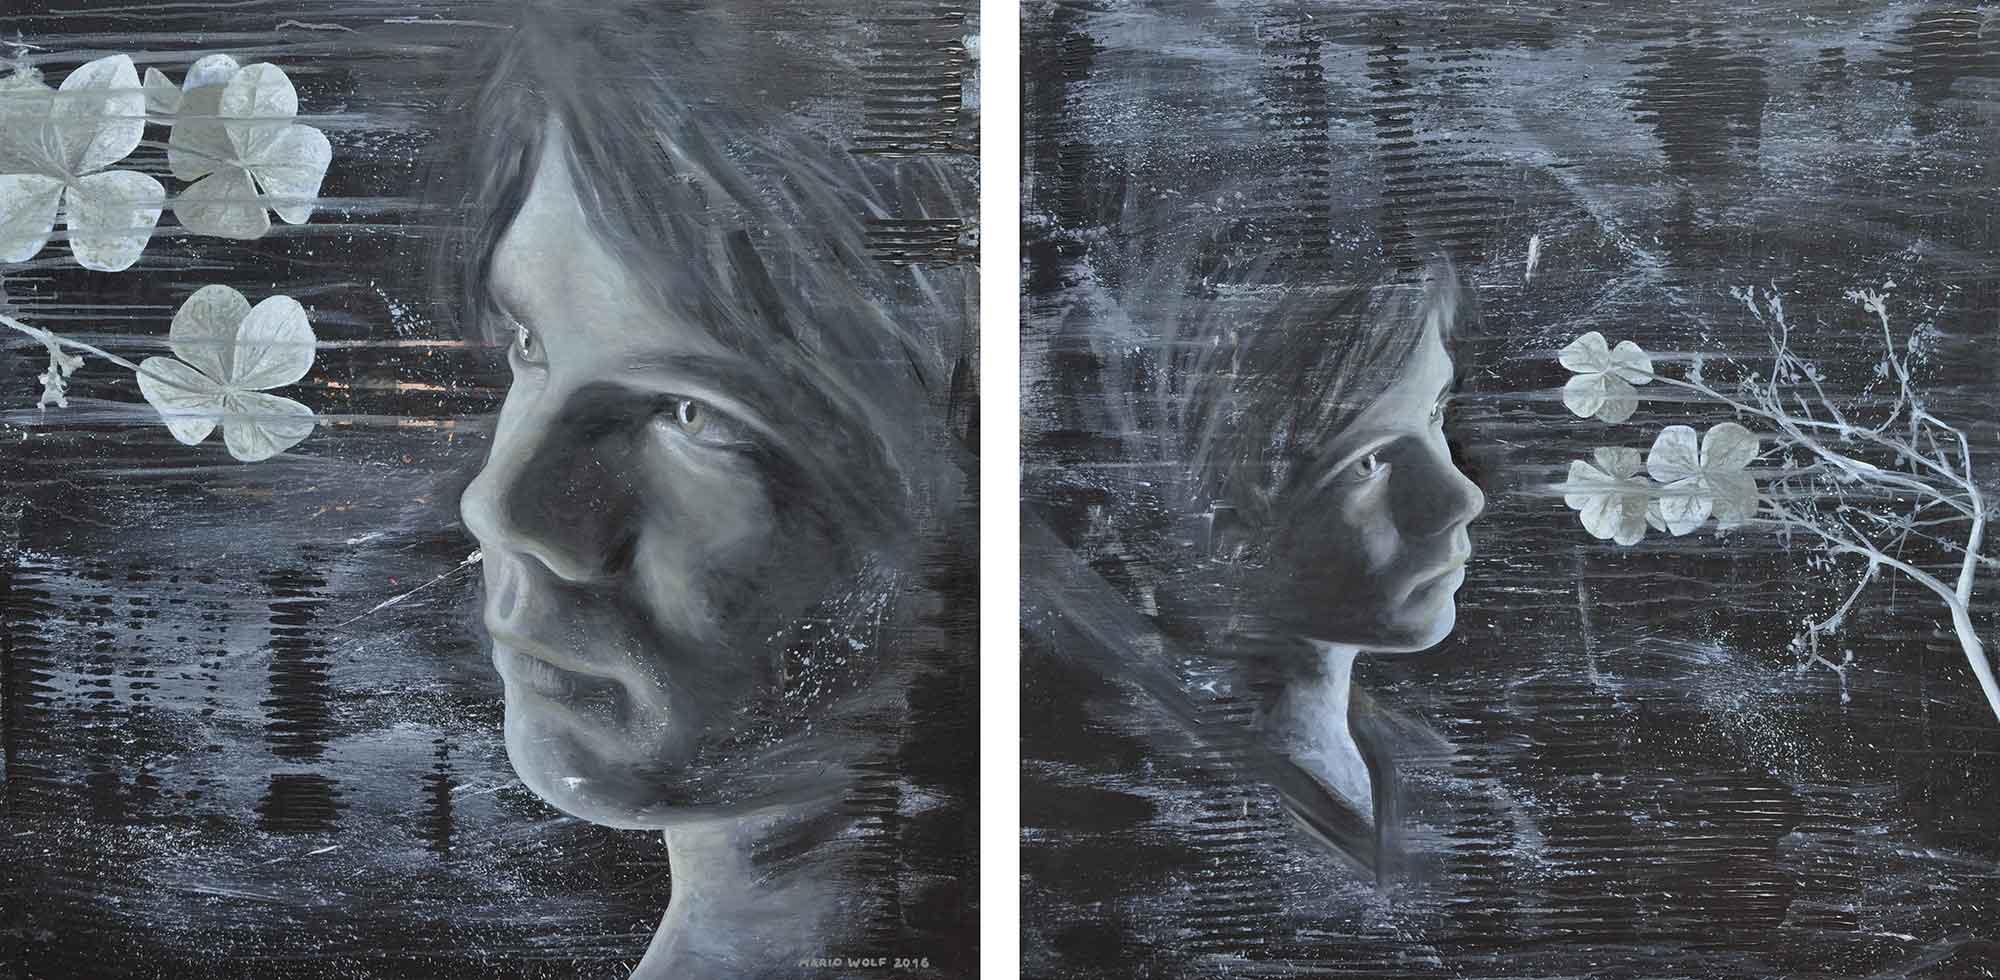 Kunst, Malerei - sehenden Auges - Künstler Mario Wolf